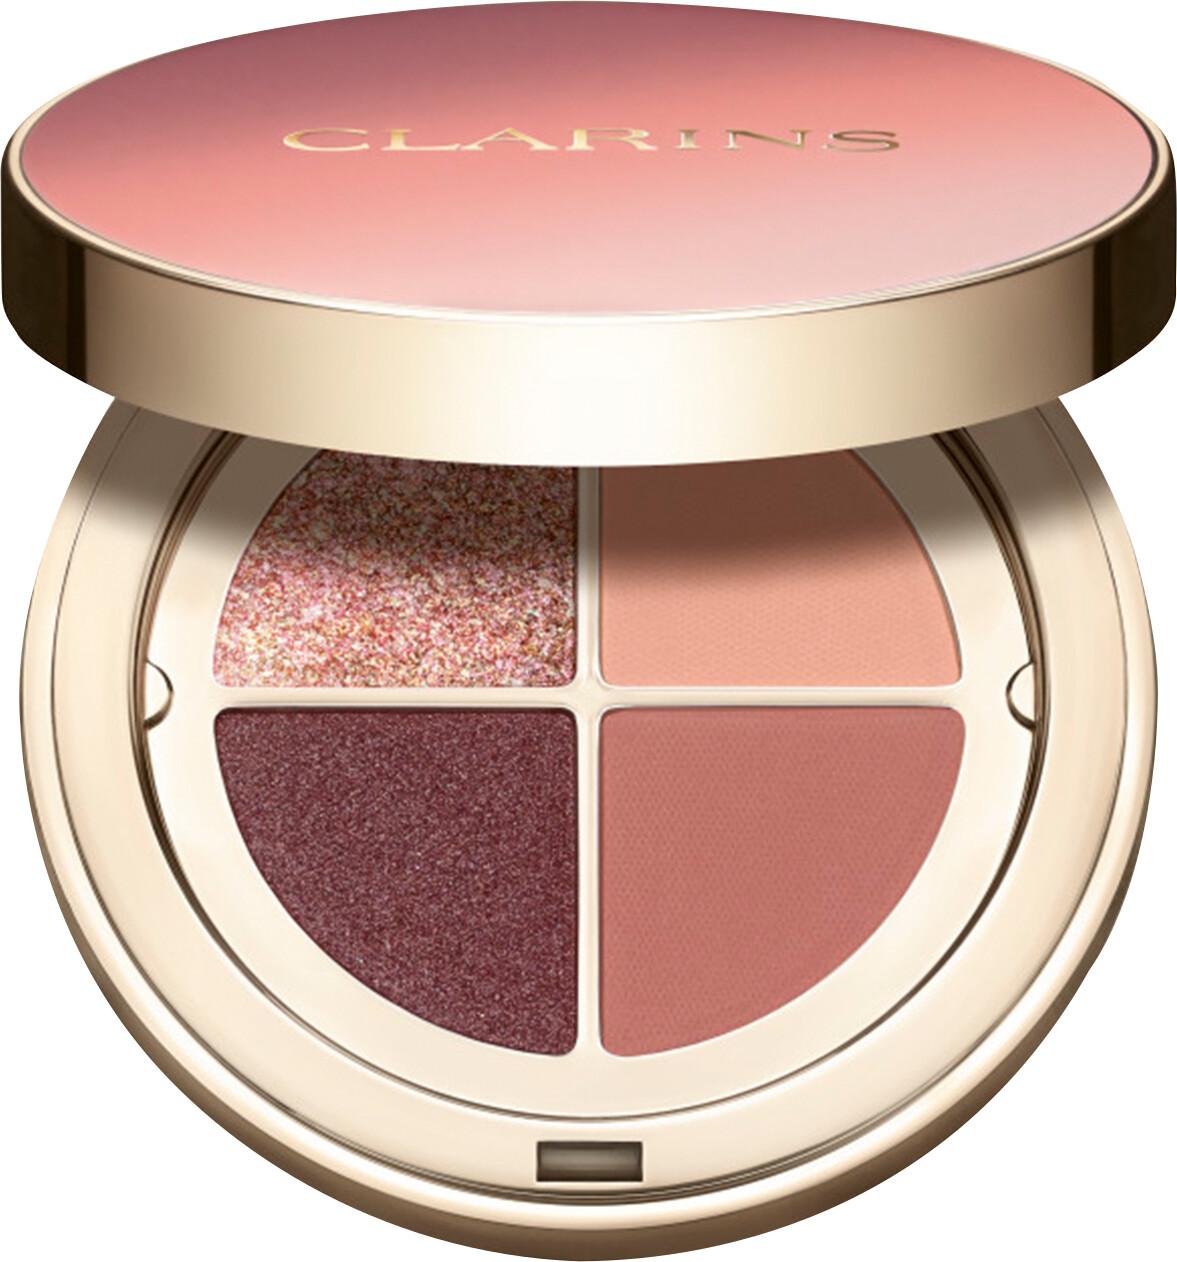 Clarins 4-Colour Eyeshadow Palette 01 - Fairy Tale Nude